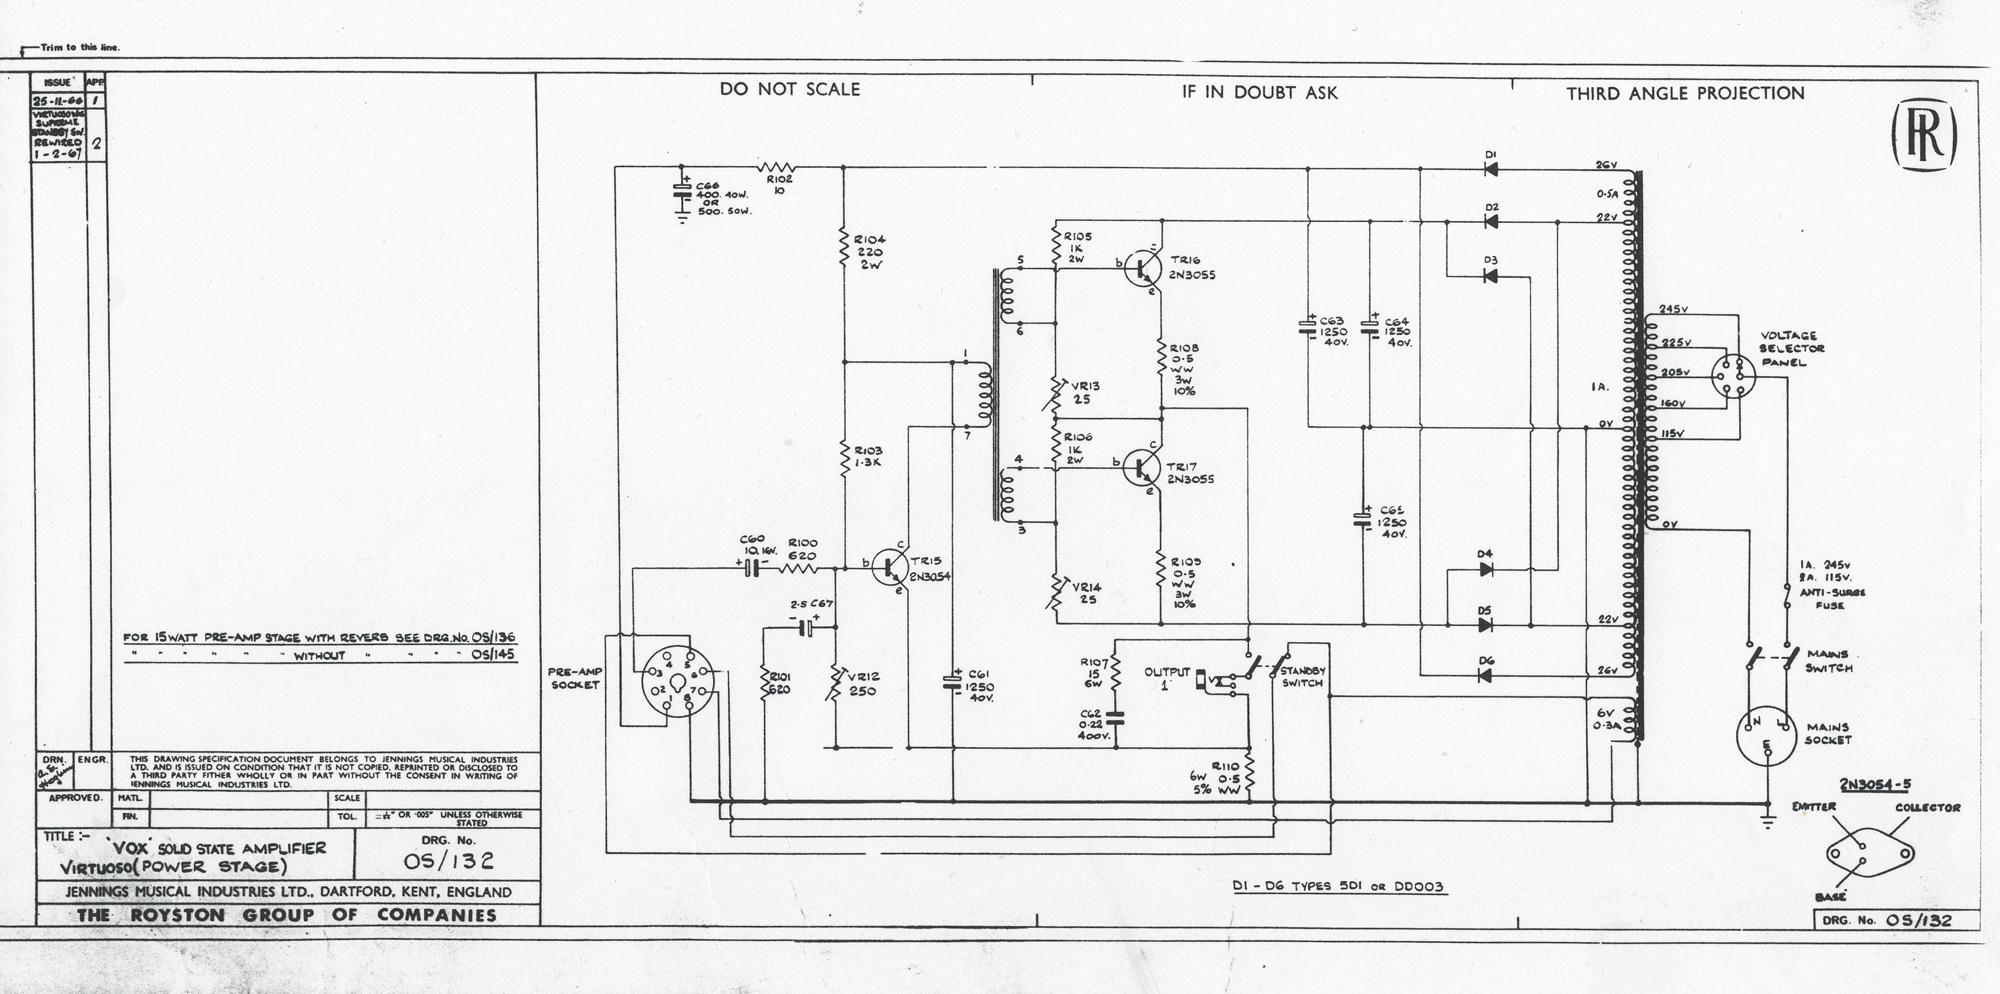 Vox Solid State schematics (circuit diagrams)